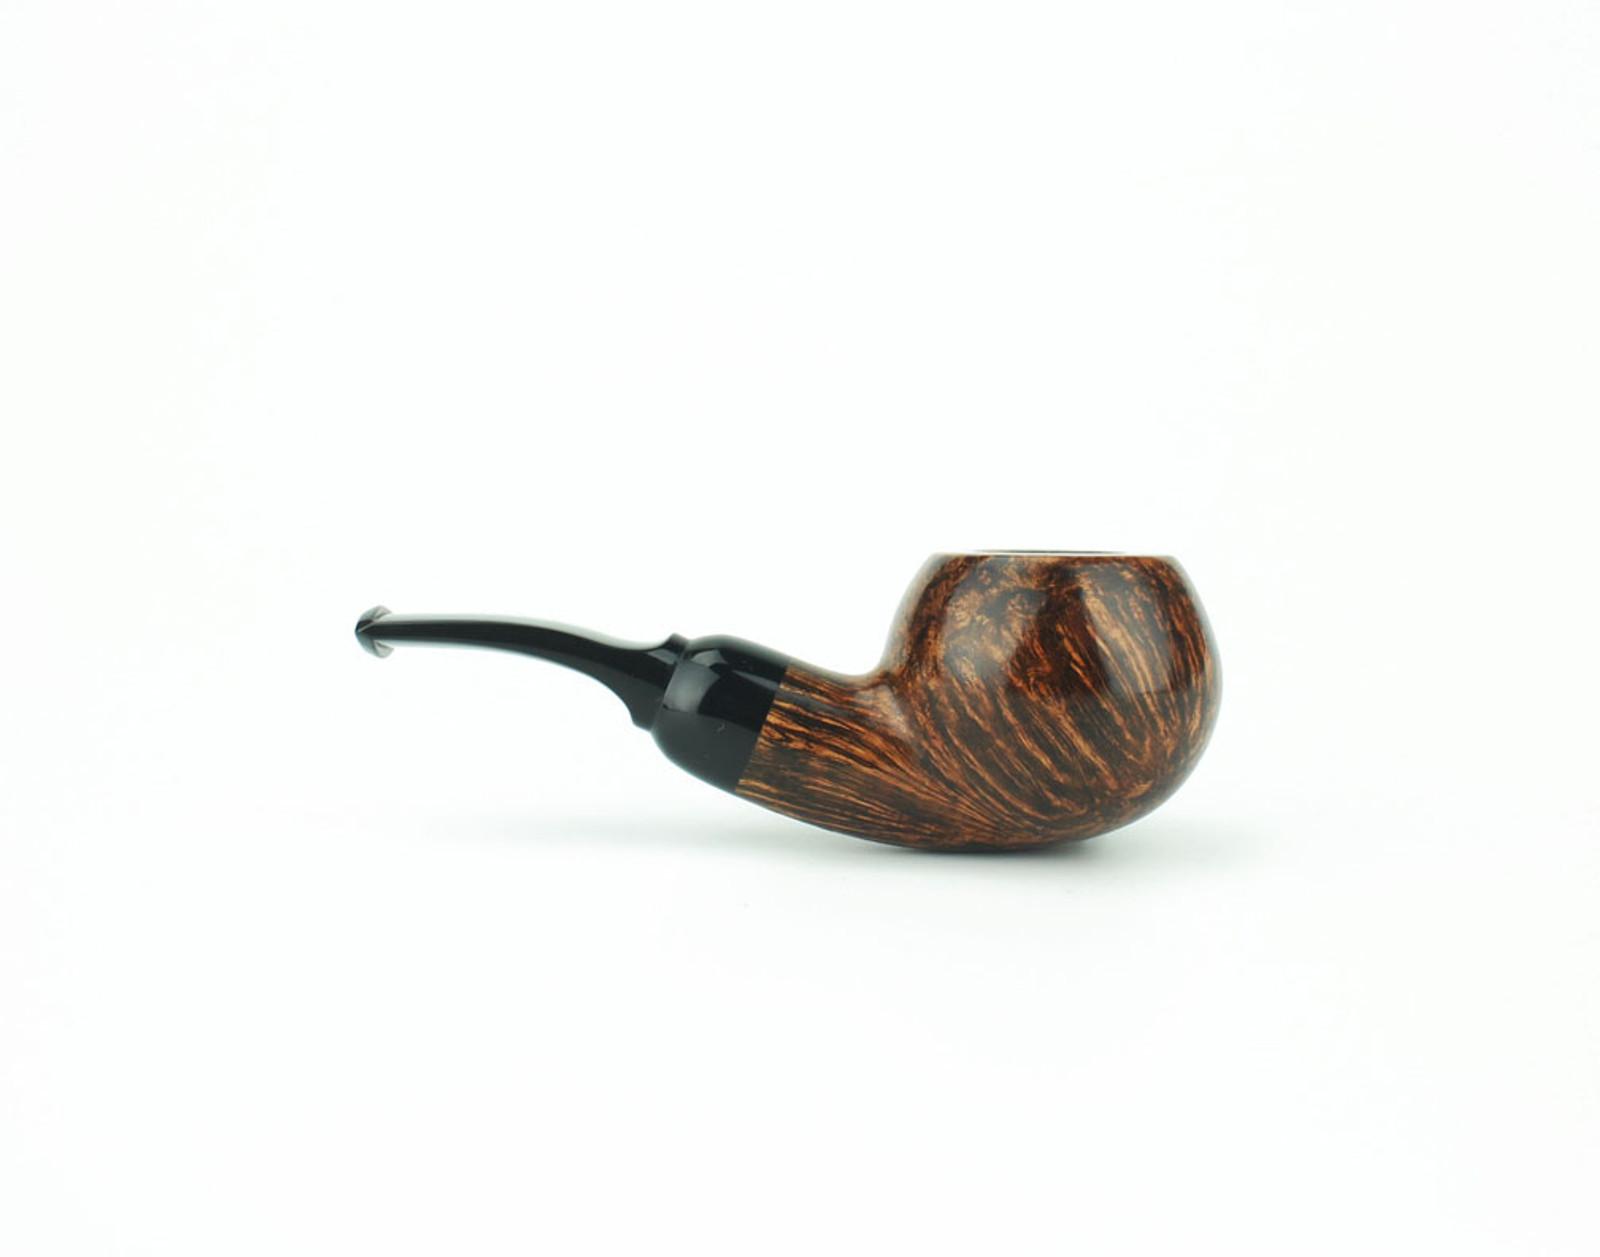 OR01DS B - BriarWorks Original OR01 Stubby Apple - Dark Smooth w/ Black Stem